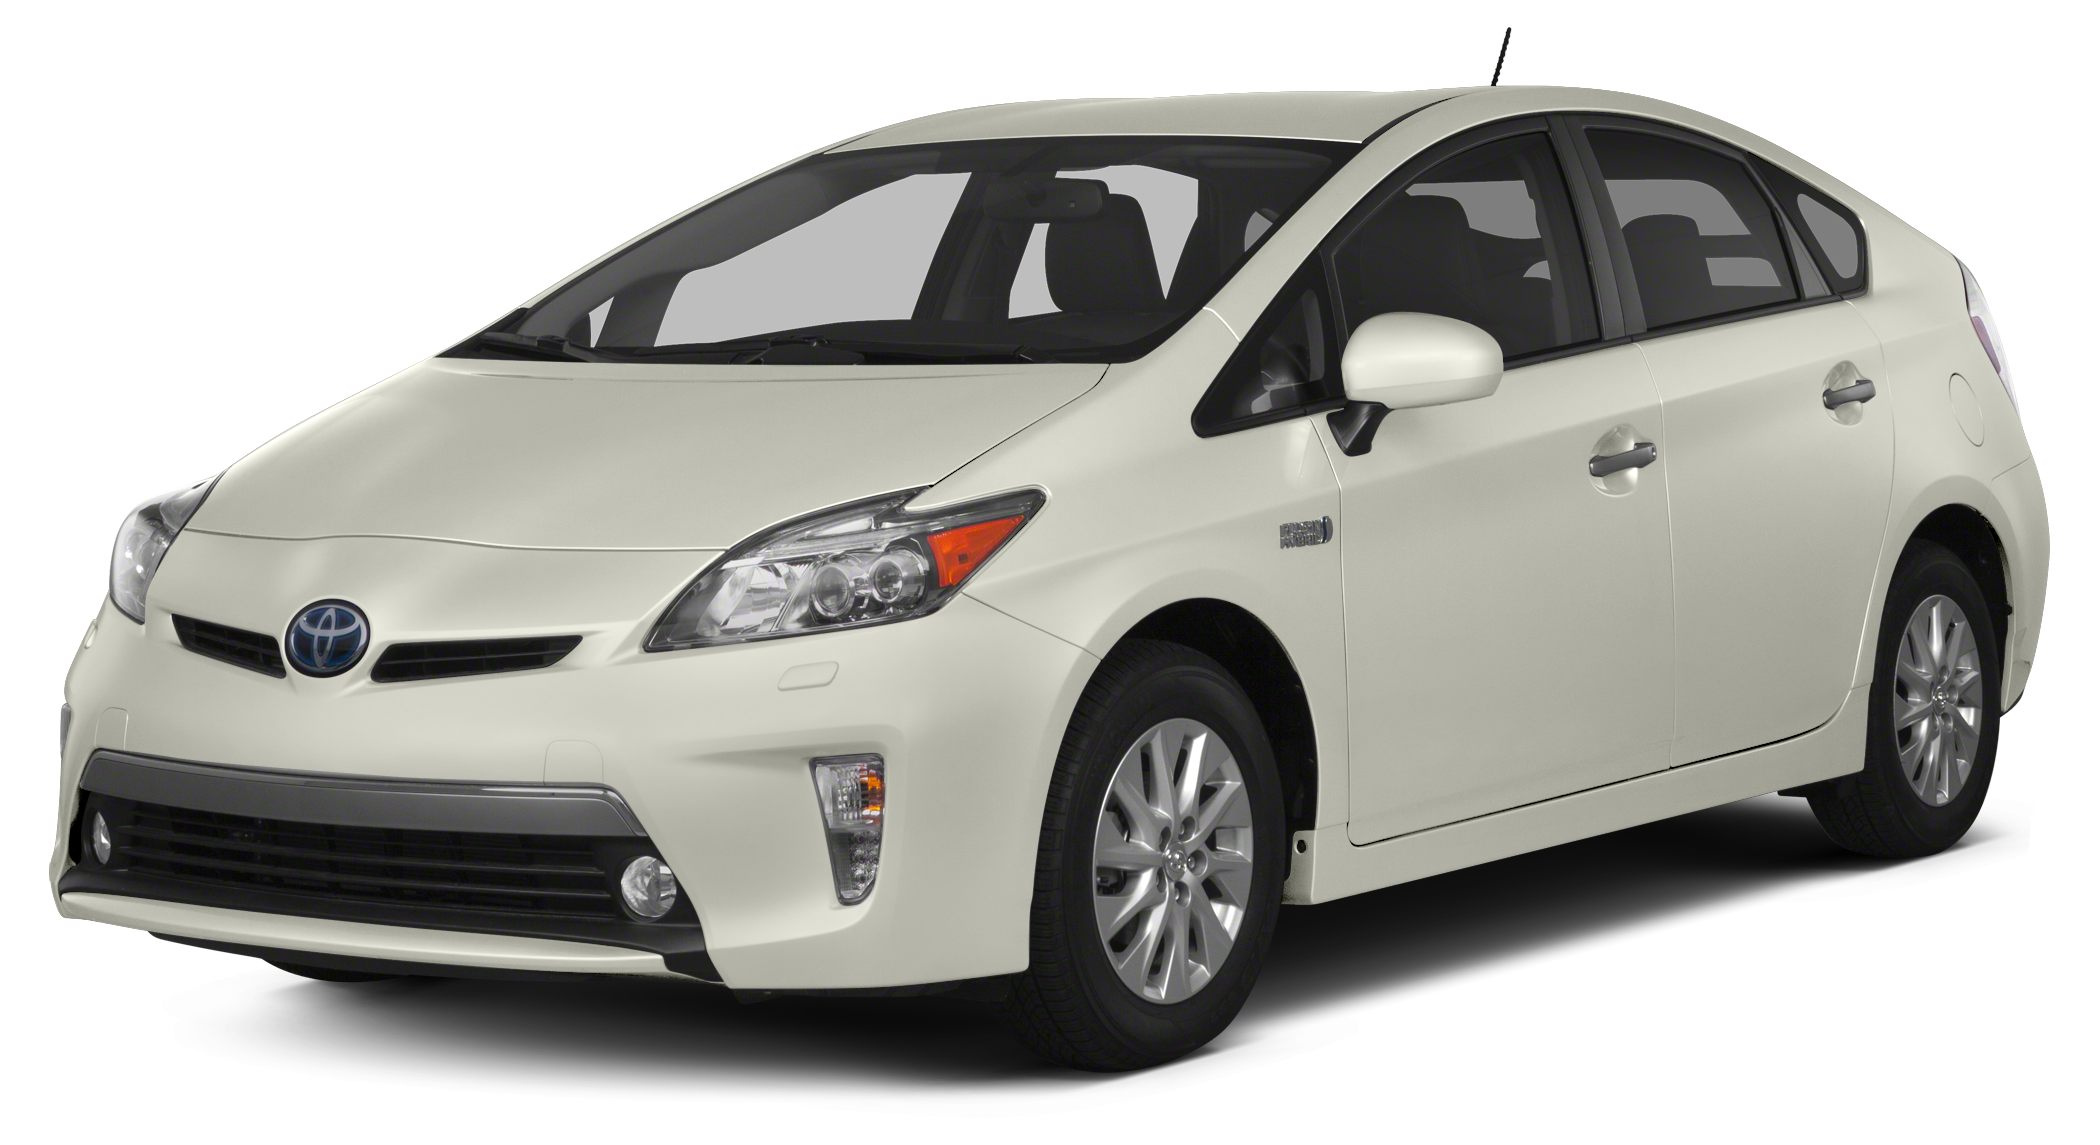 2012 Toyota Prius Plug-in Base BLIZZARD PEARL exterior and DARK GRAY interior FUEL EFFICIENT 49 M